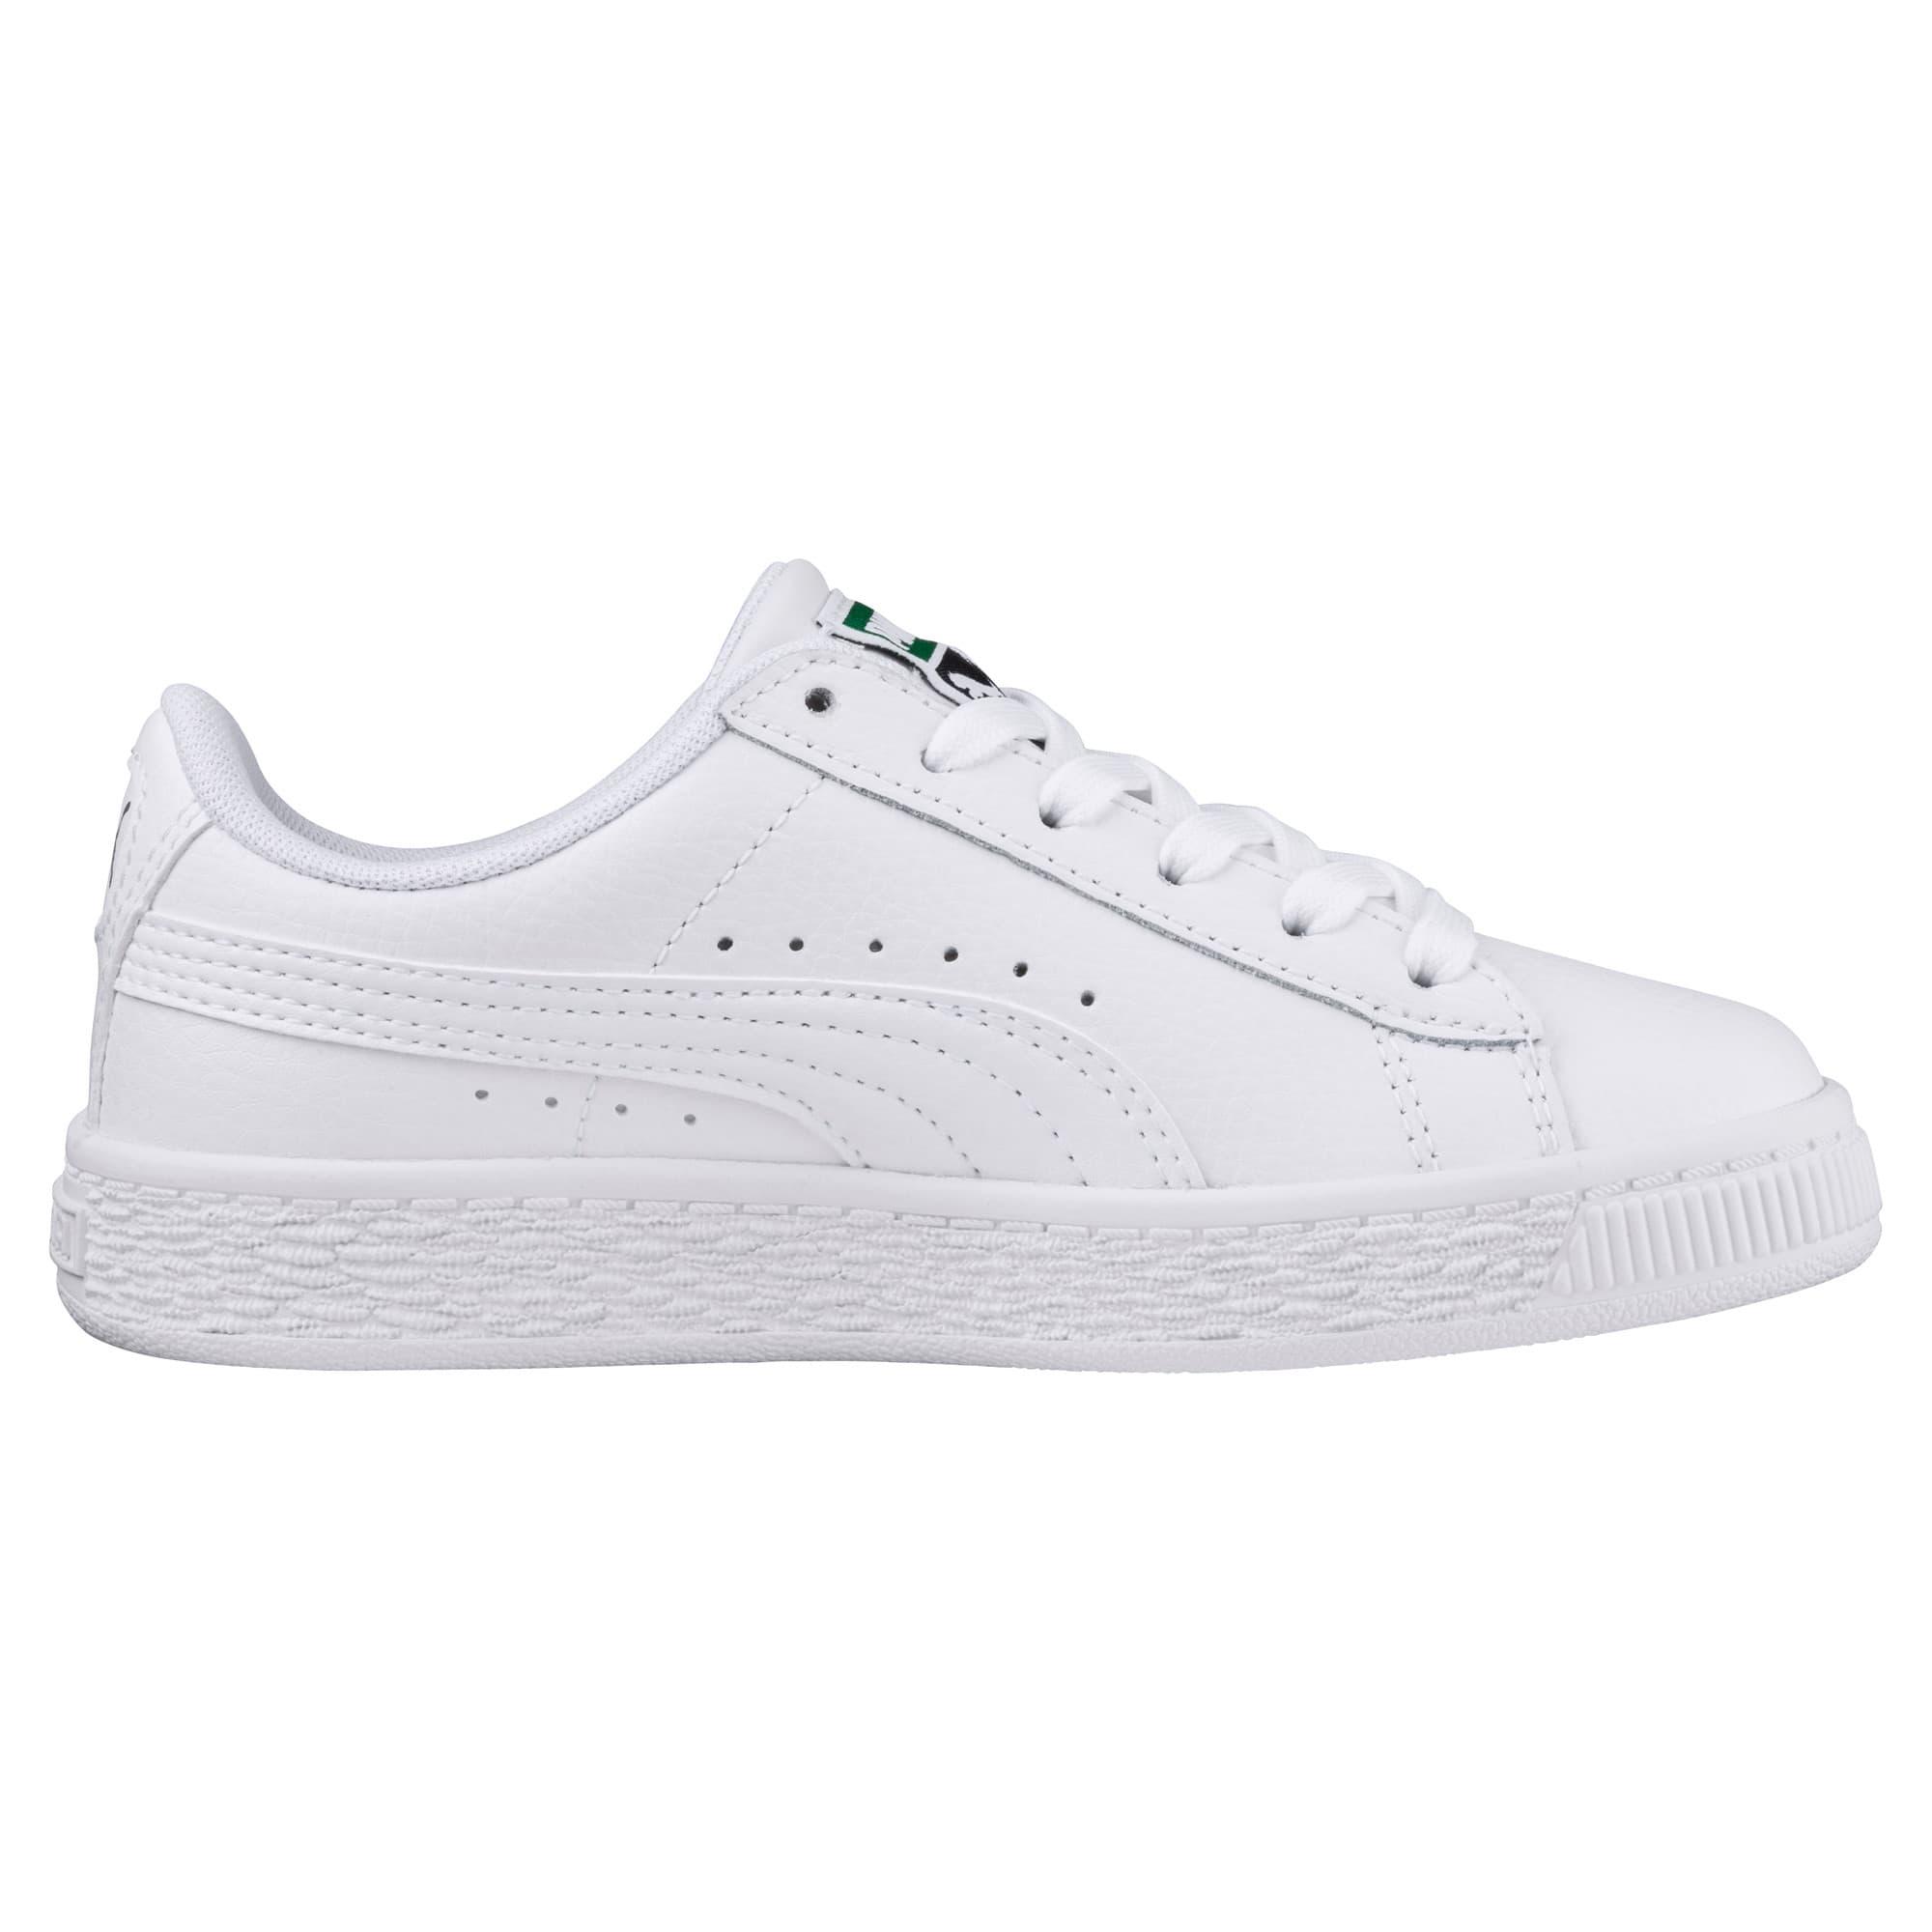 Thumbnail 4 of Basket Classic Kinder Sneaker, Puma White-Puma White, medium